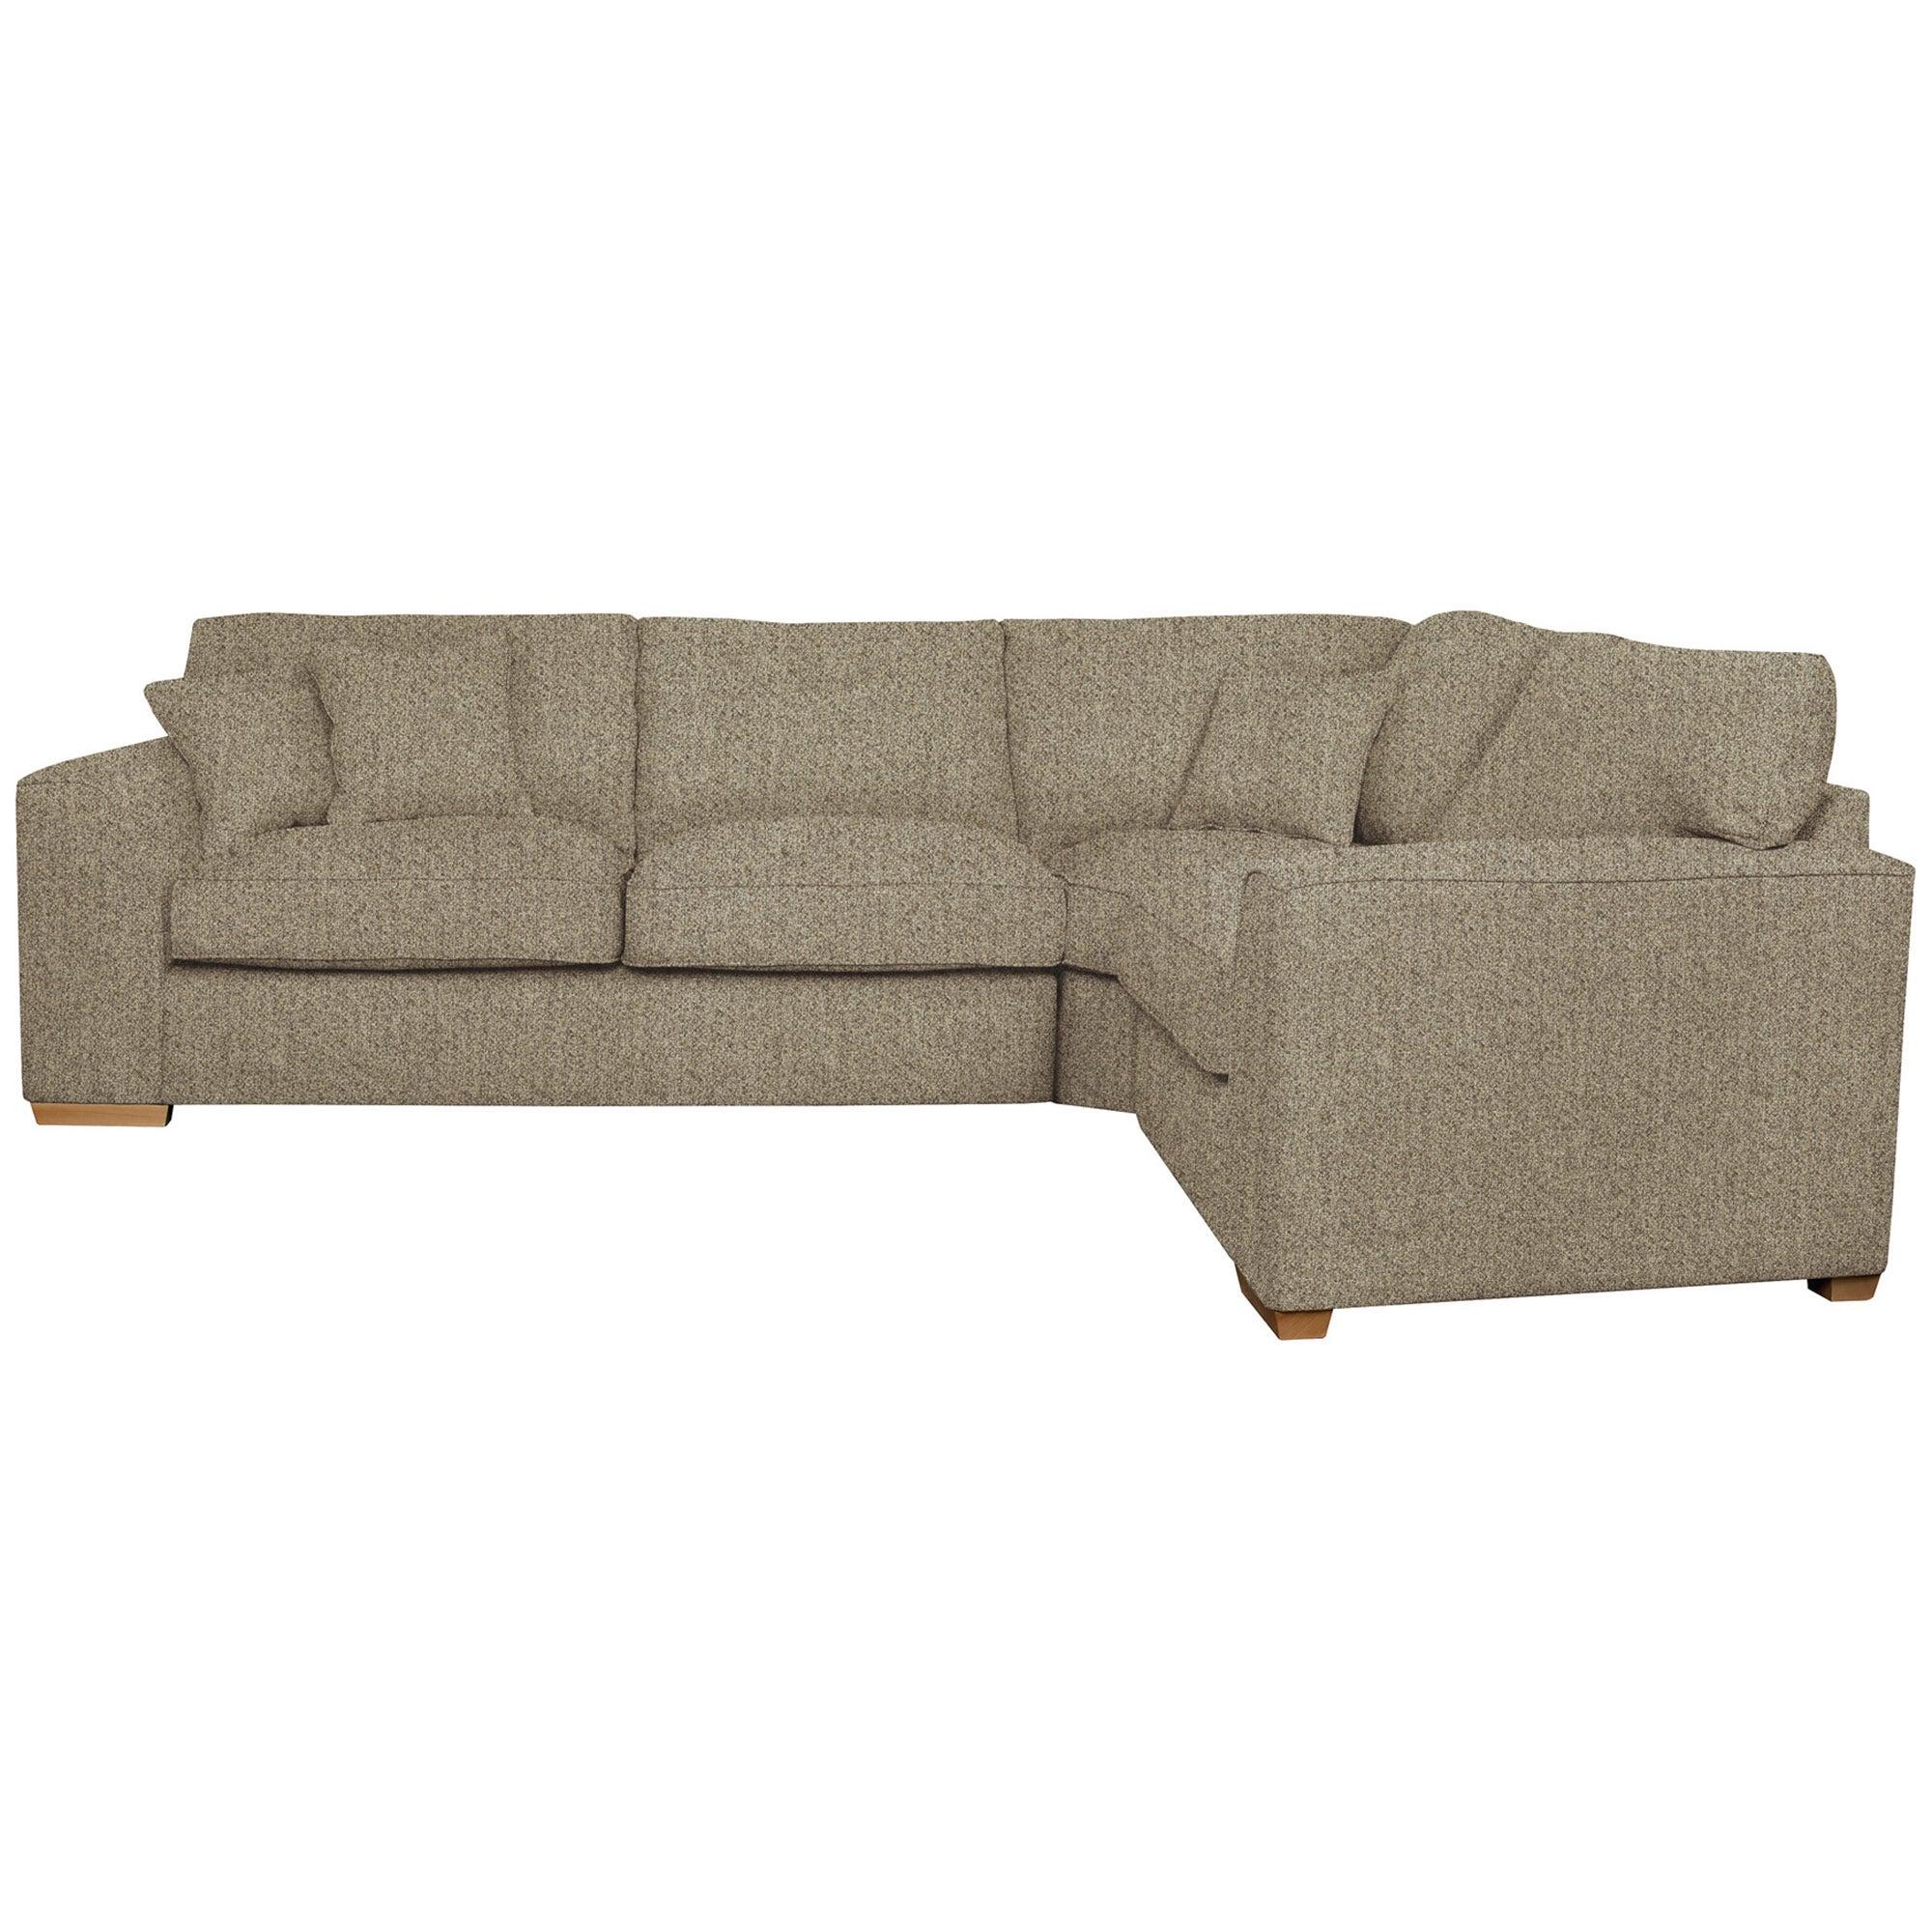 Hove Corner Sofa